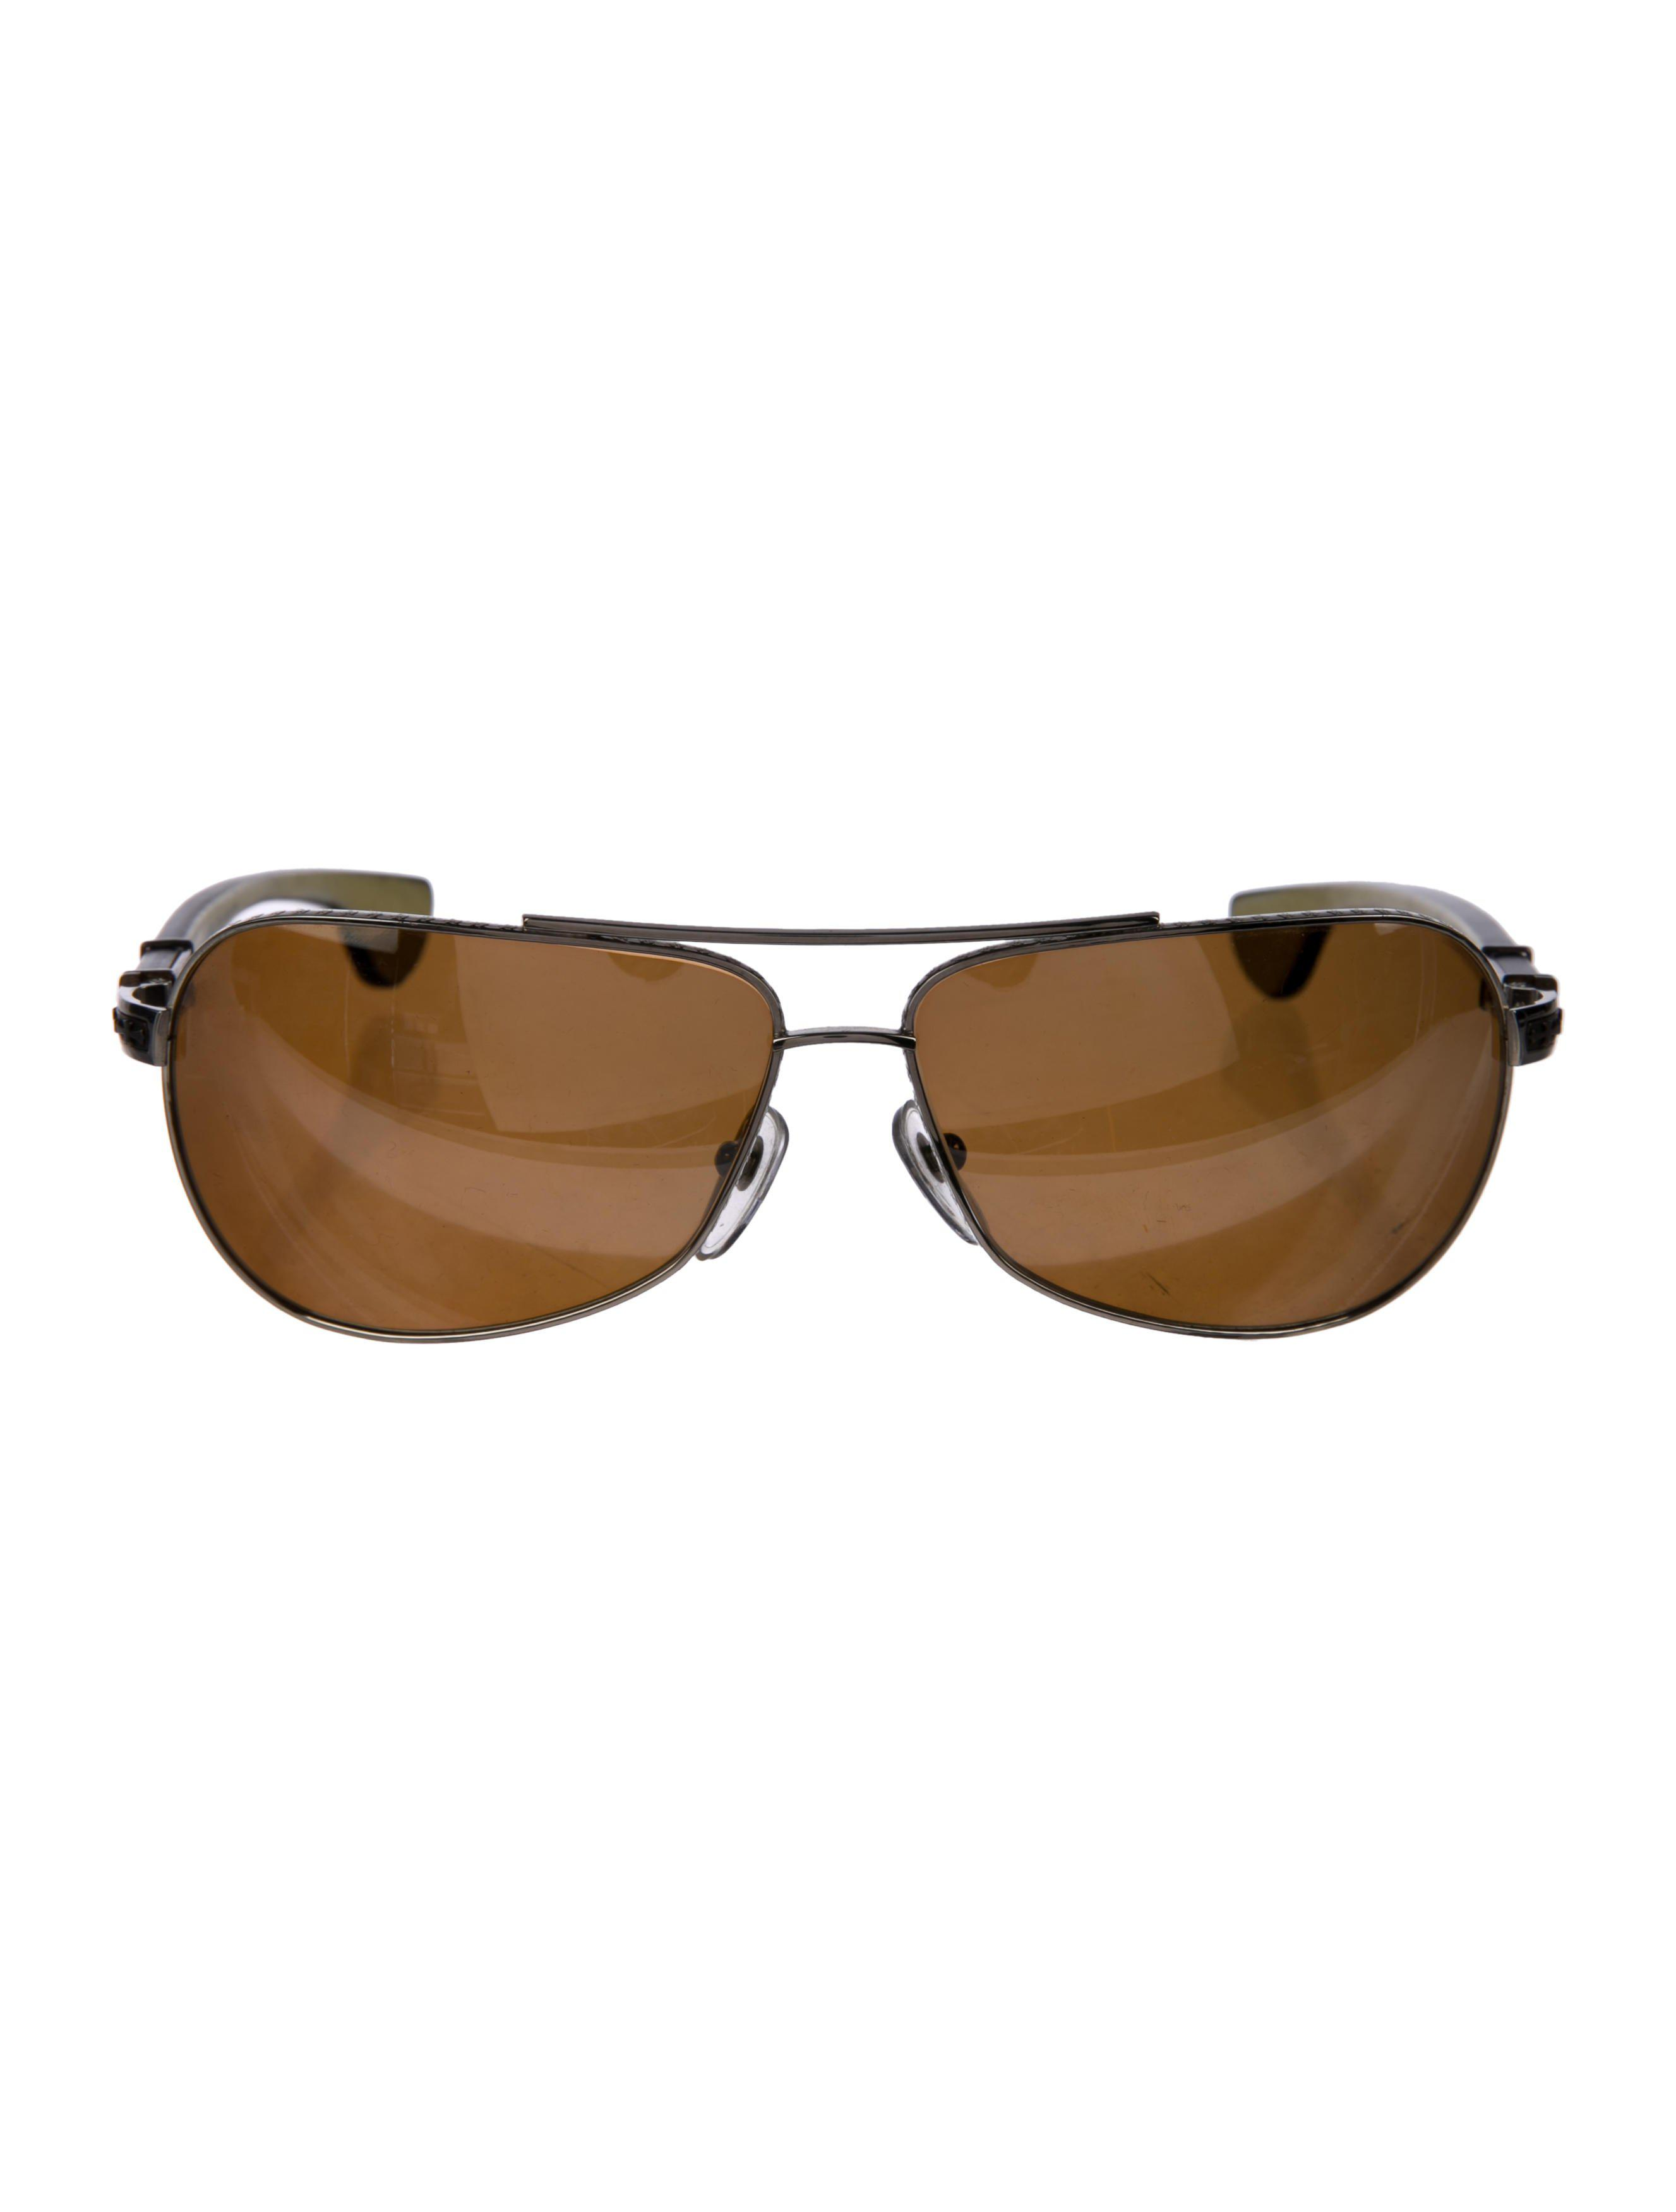 2f98ebb91913a Lyst - Chrome Hearts The Beast I Sunglasses Gold in Metallic